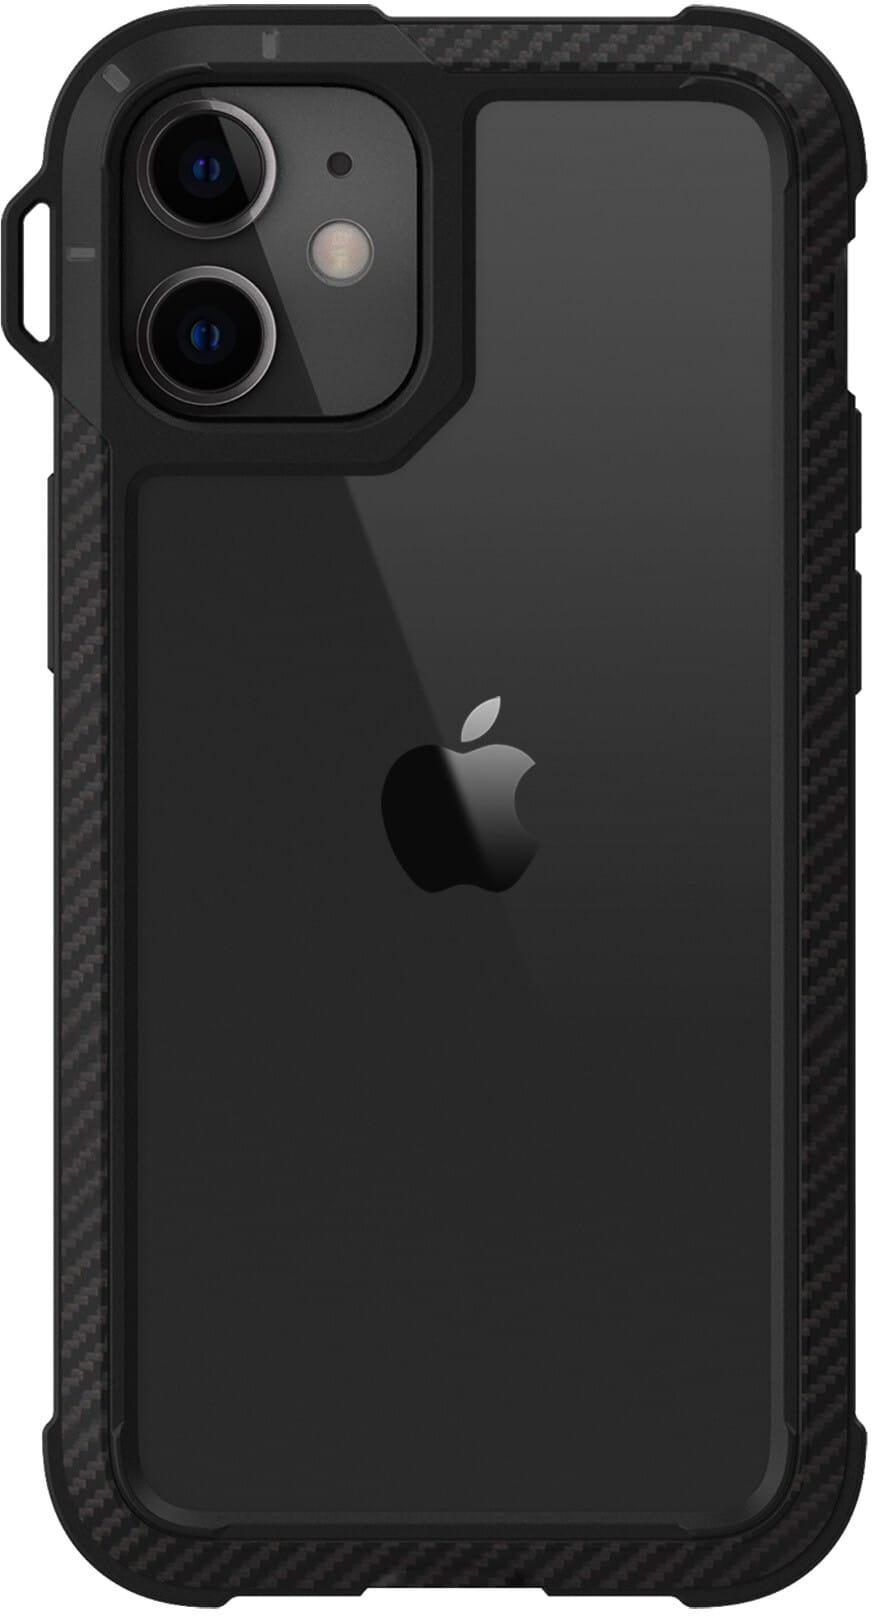 SwitchEasy Explorer Case (iPhone 12 Pro Max)